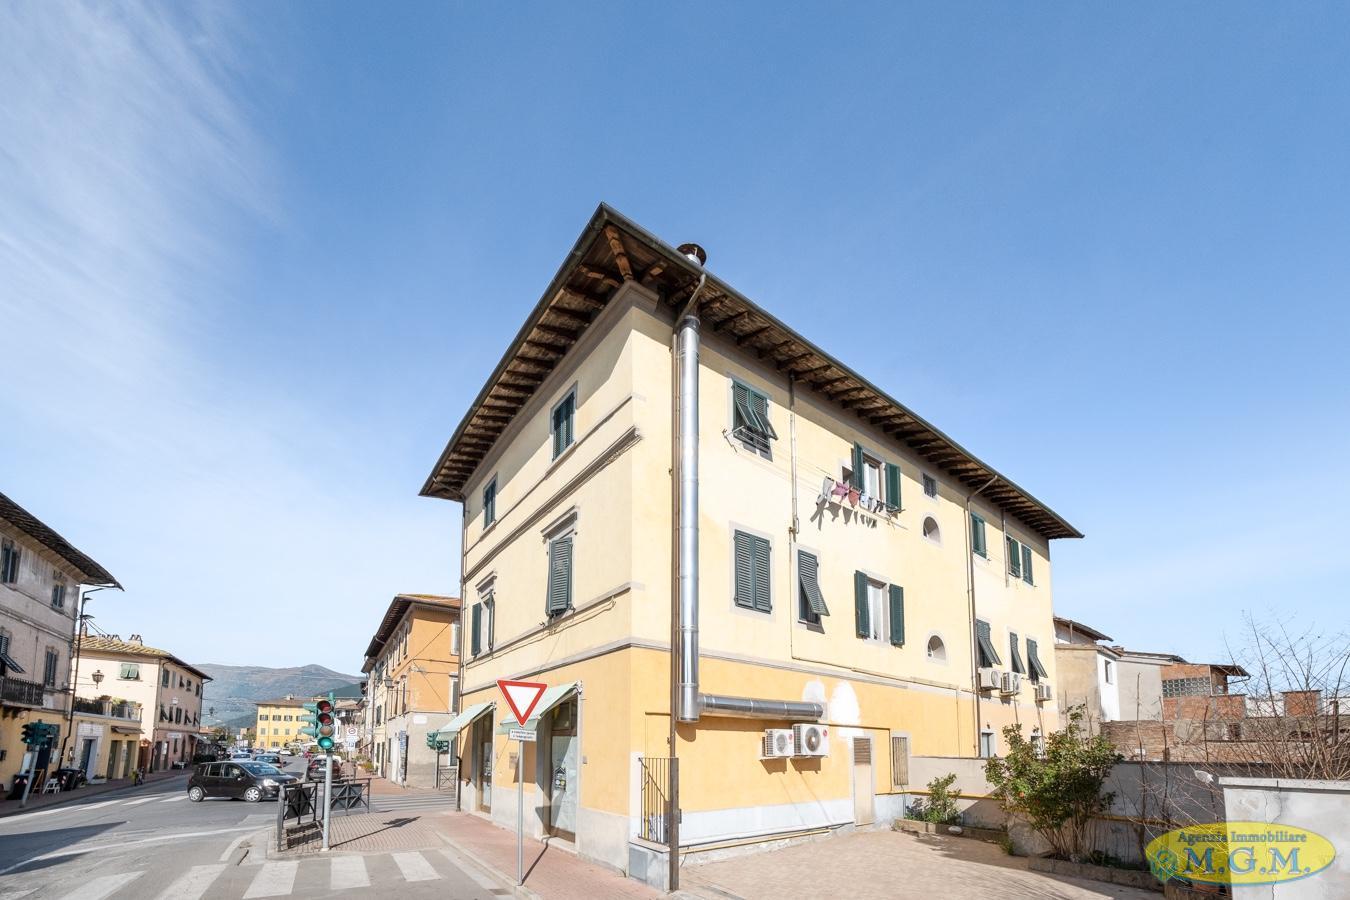 Mgmnet.it: Locale comm.le/Fondo in affitto a Bientina